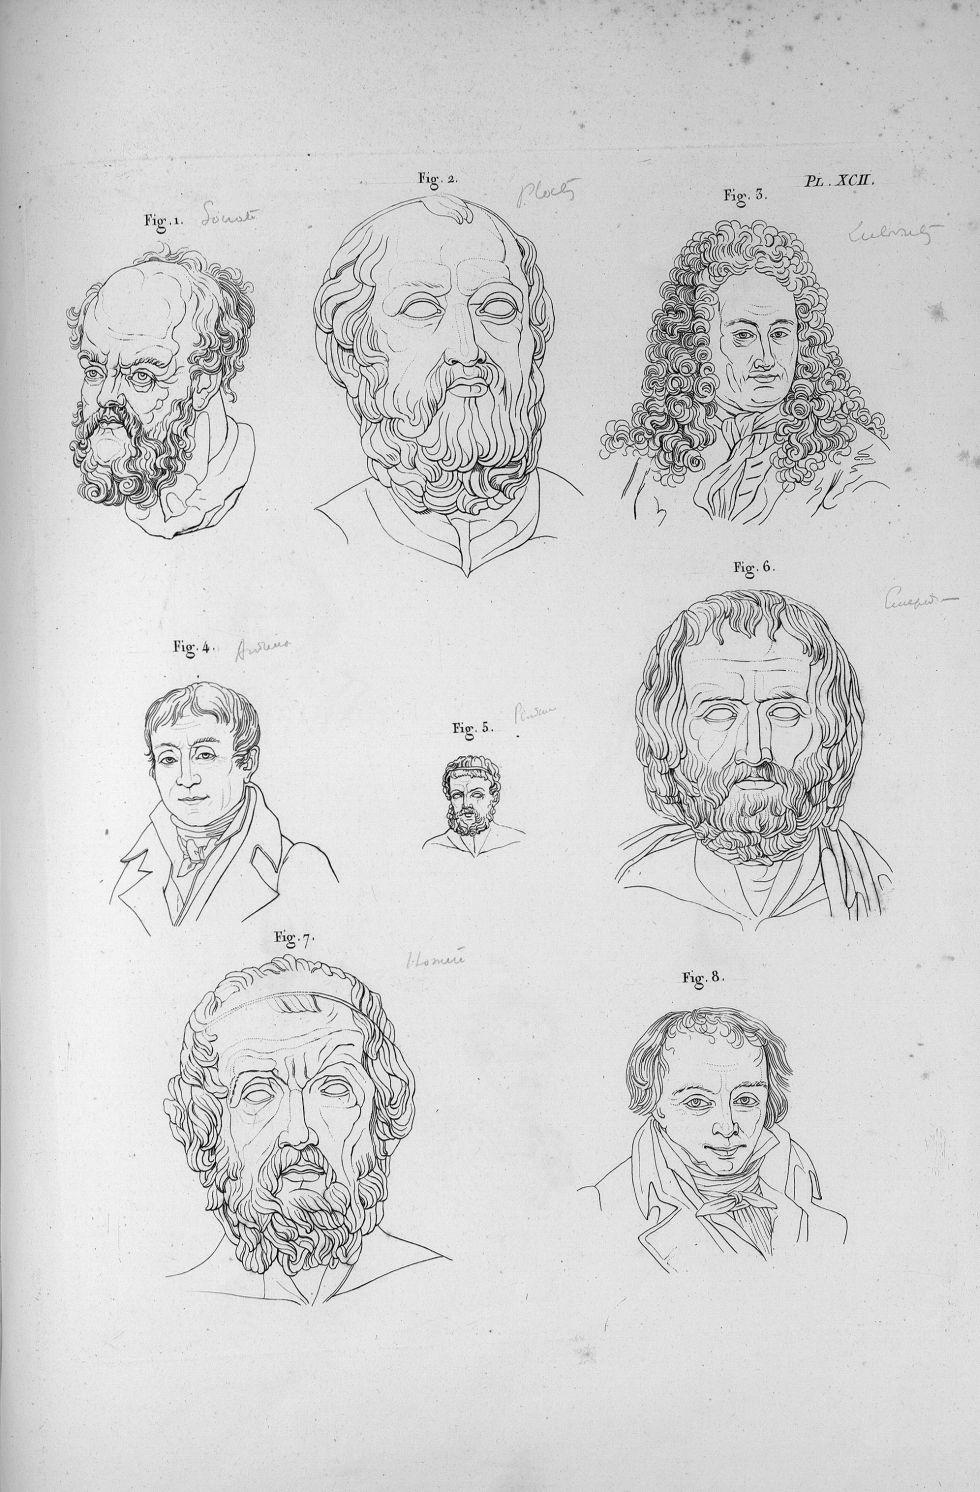 Pl. XCII. Fig. 1. Socrate / Fig. 2. Platon / Fig. 3. Leibnitz / Fig. 4. Andrieux / Fig. 5. Pindare / [...] - Anatomie. Neurologie. Têtes. Phrénologie. 19e siècle (France) - med00575x04x0317